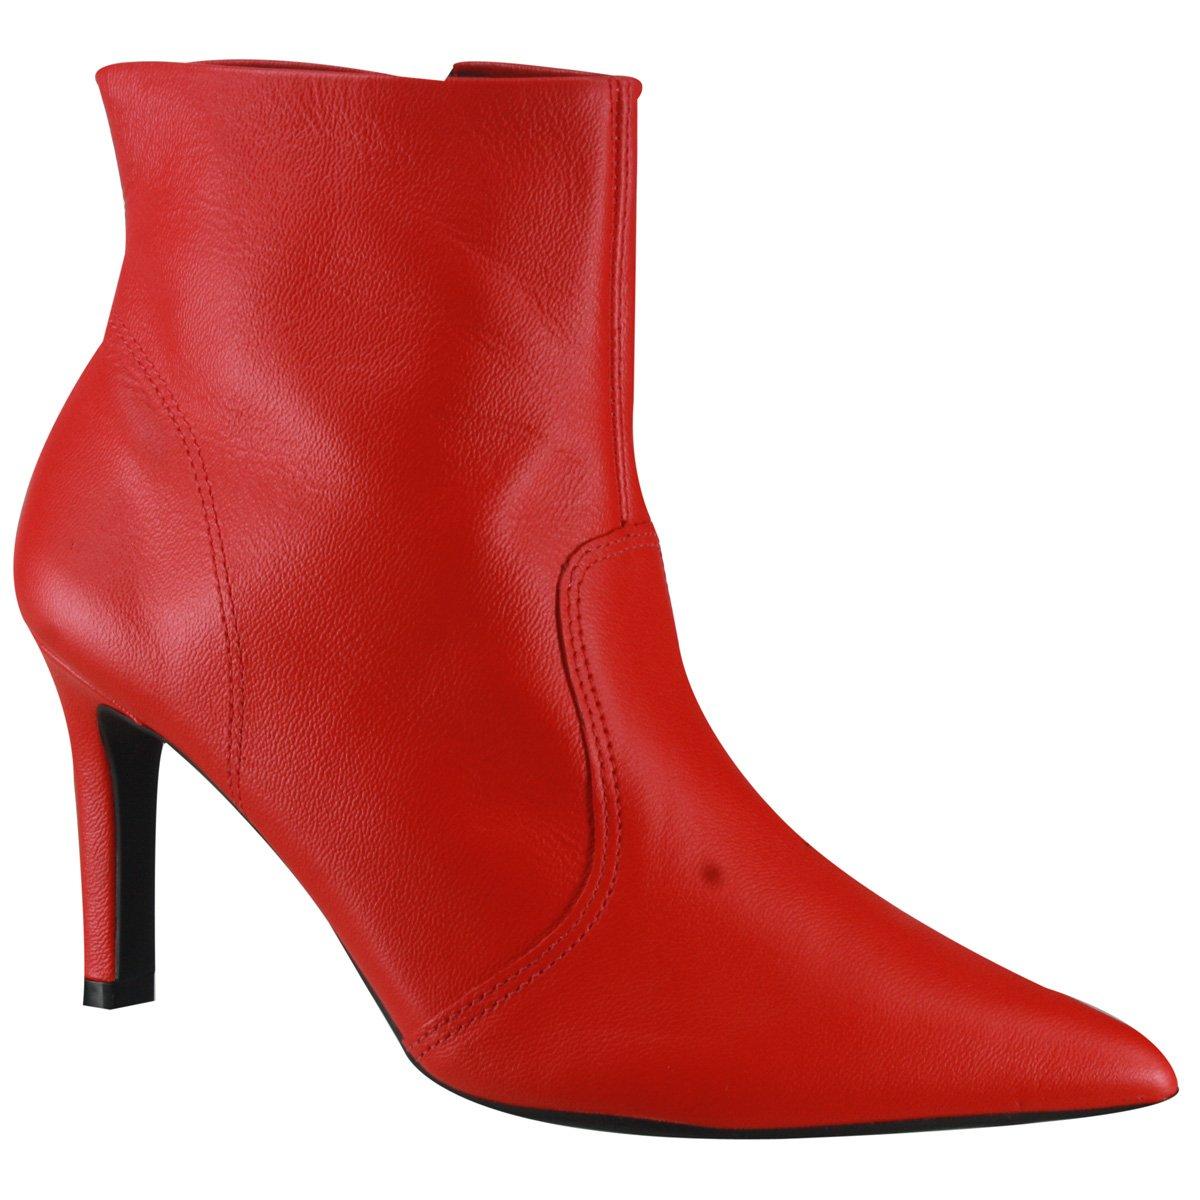 7a12ba73e3 Bota Feminina Ankle Boot Usaflex Z4002 2 - Aurora Red (Caprina ...